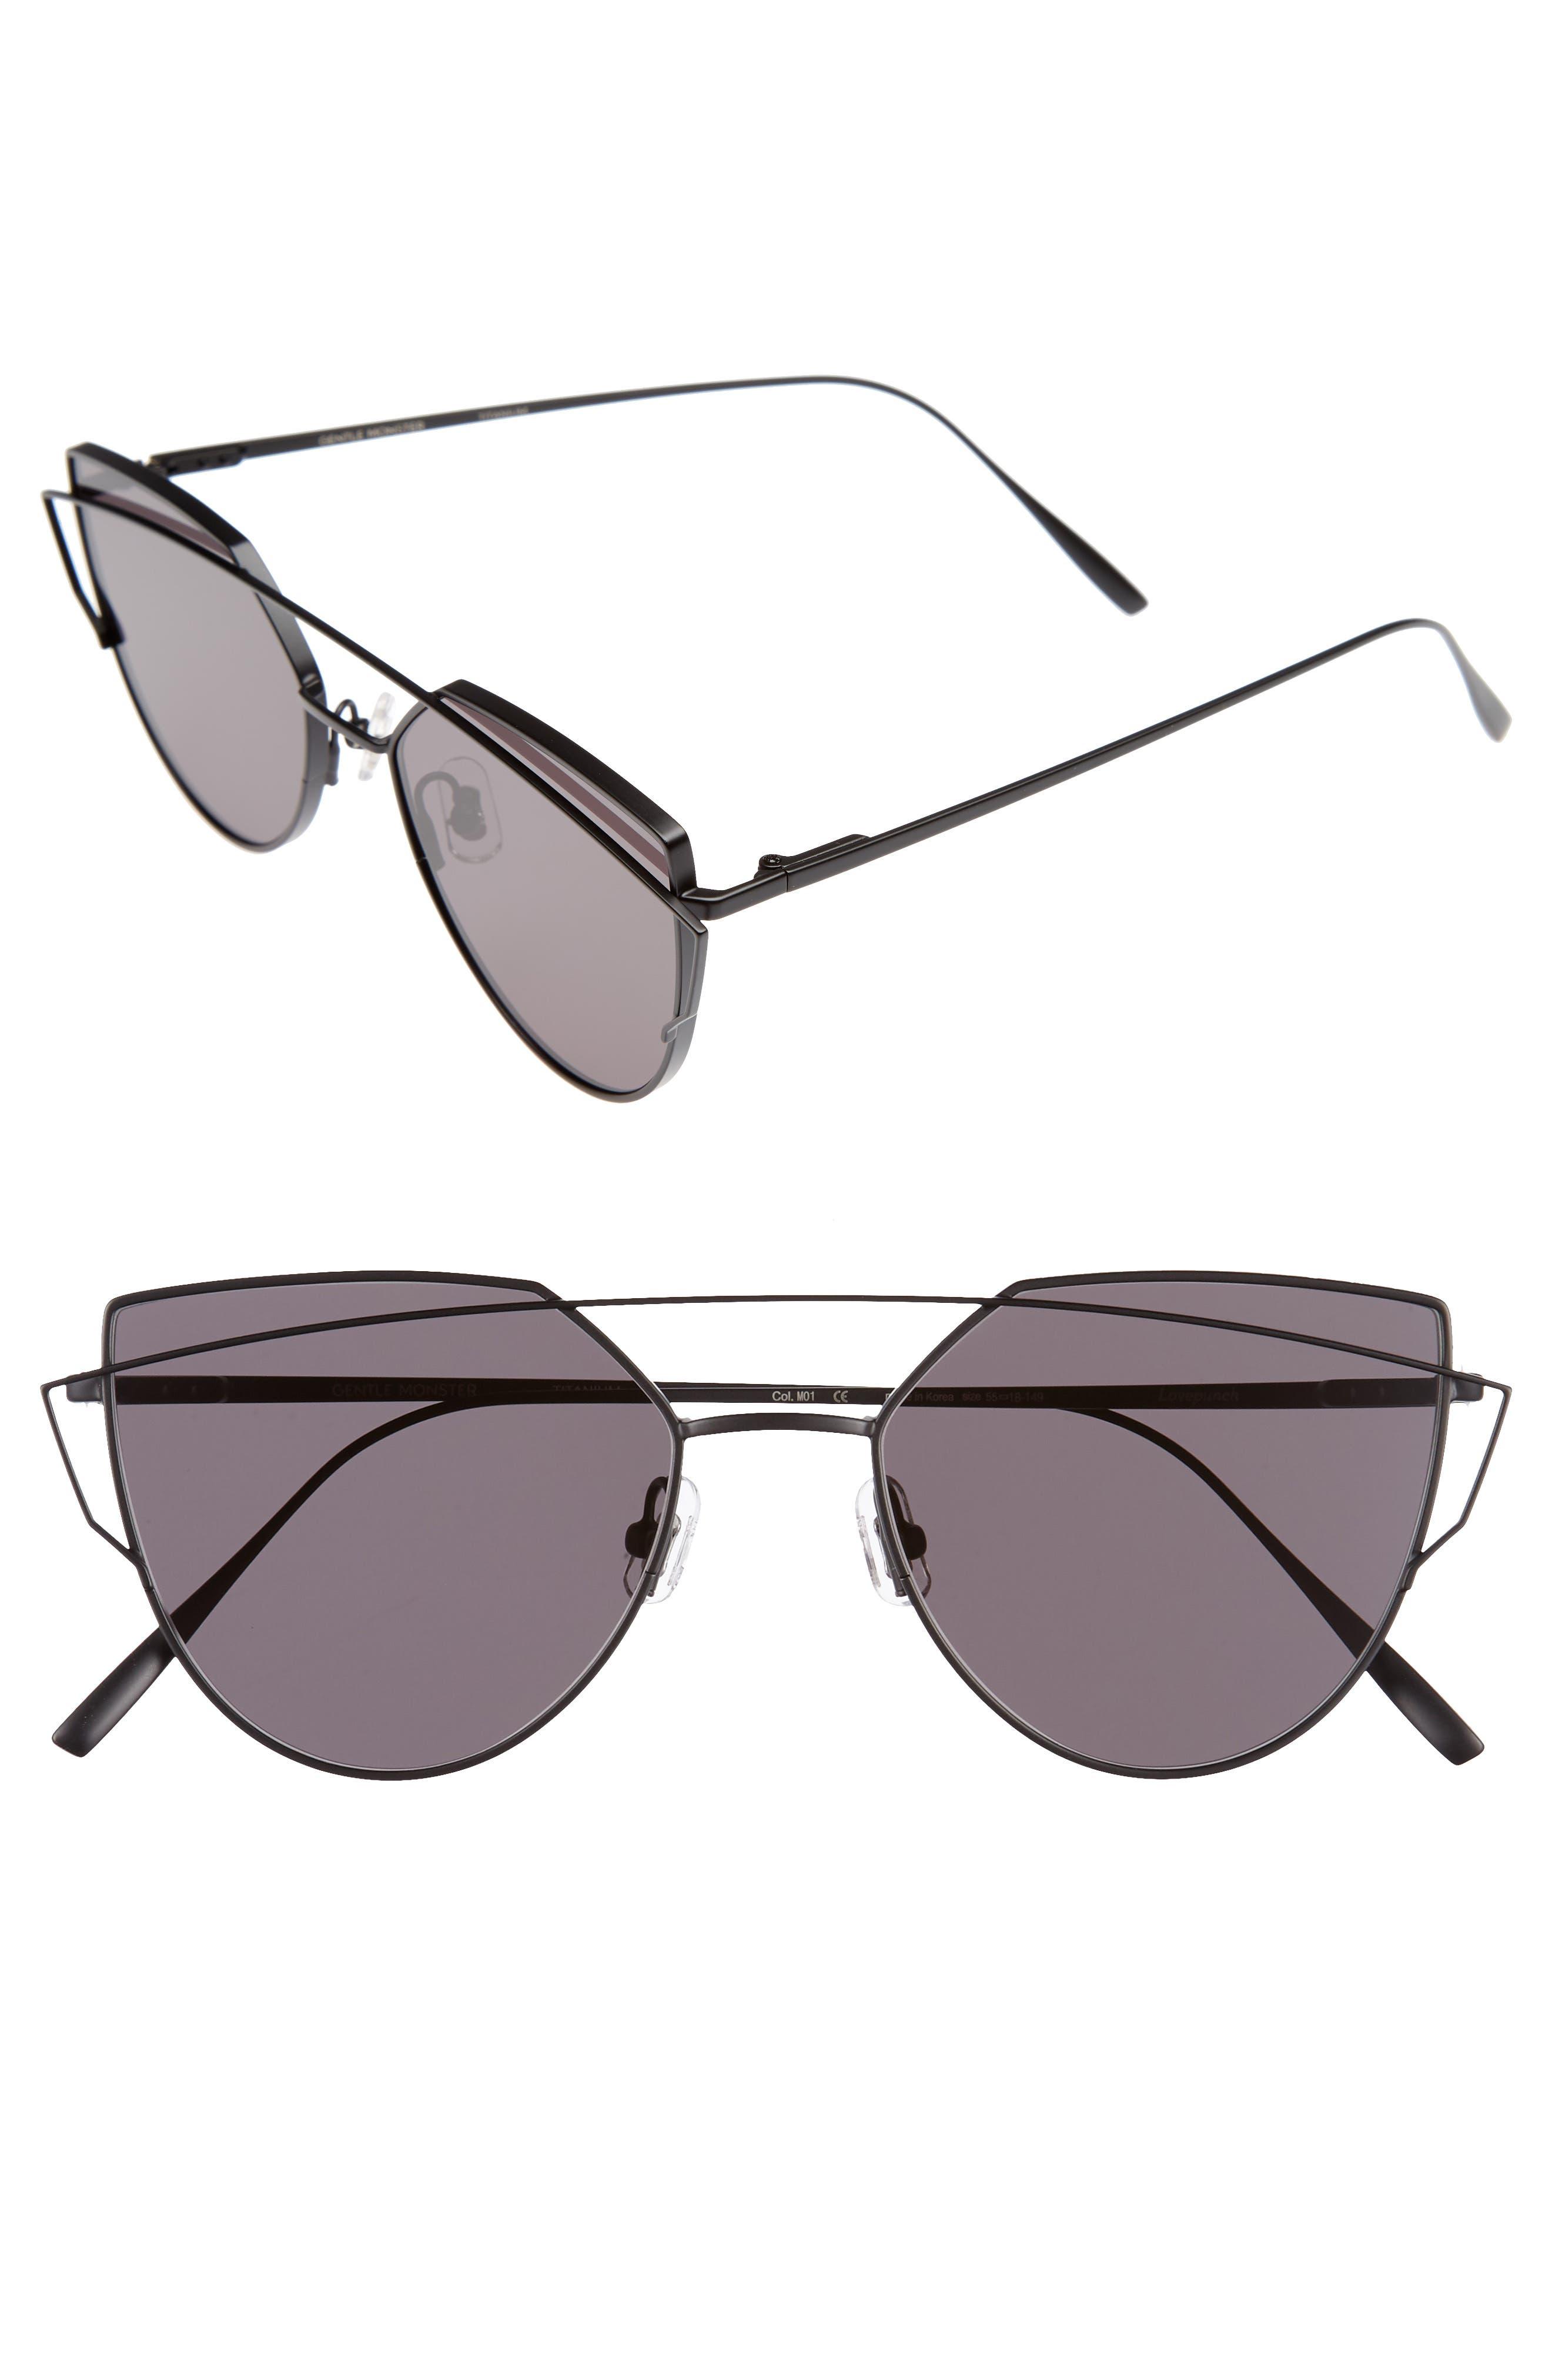 Love Punch 55mm Titanium Aviator Sunglasses,                             Main thumbnail 1, color,                             001